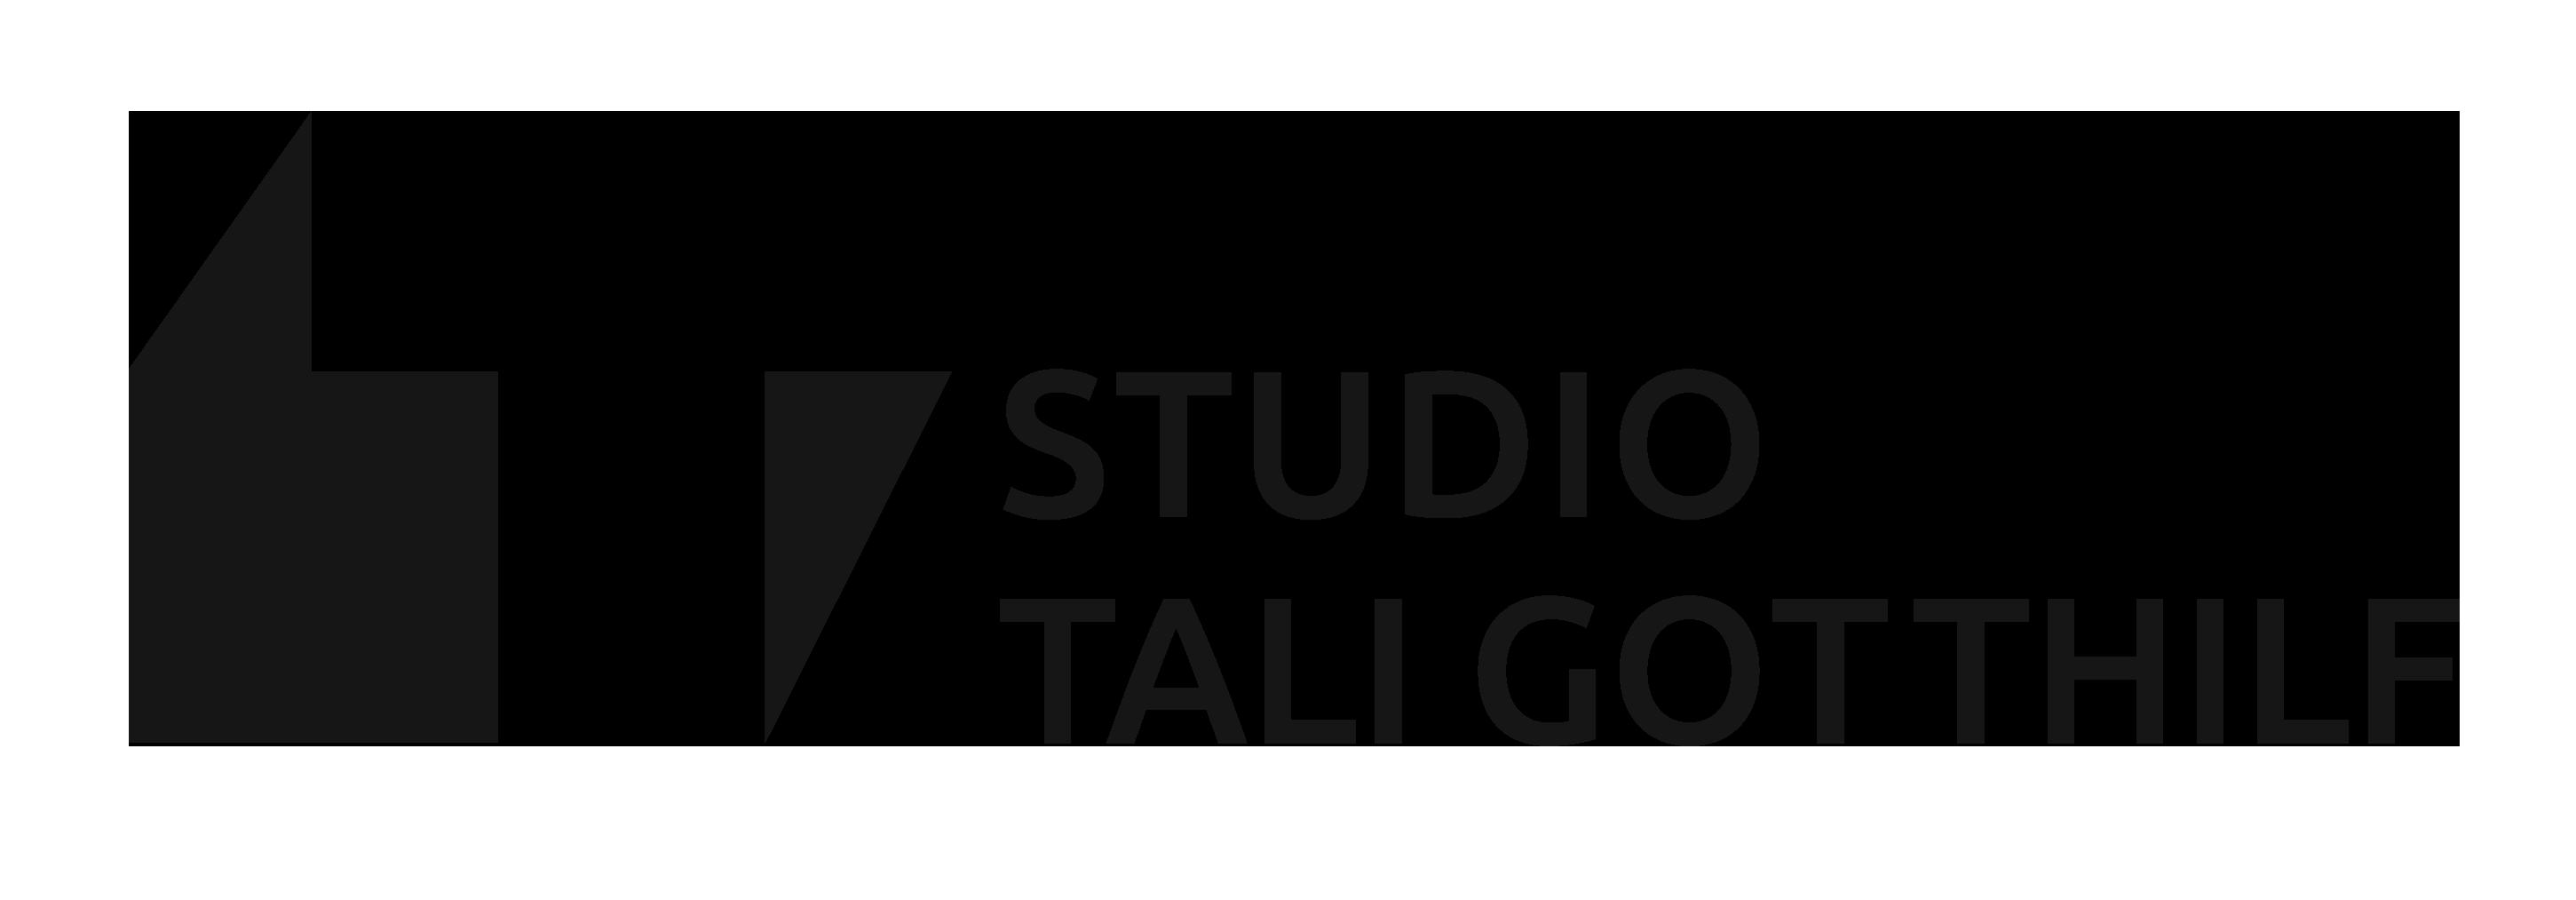 Tali Gothhilf